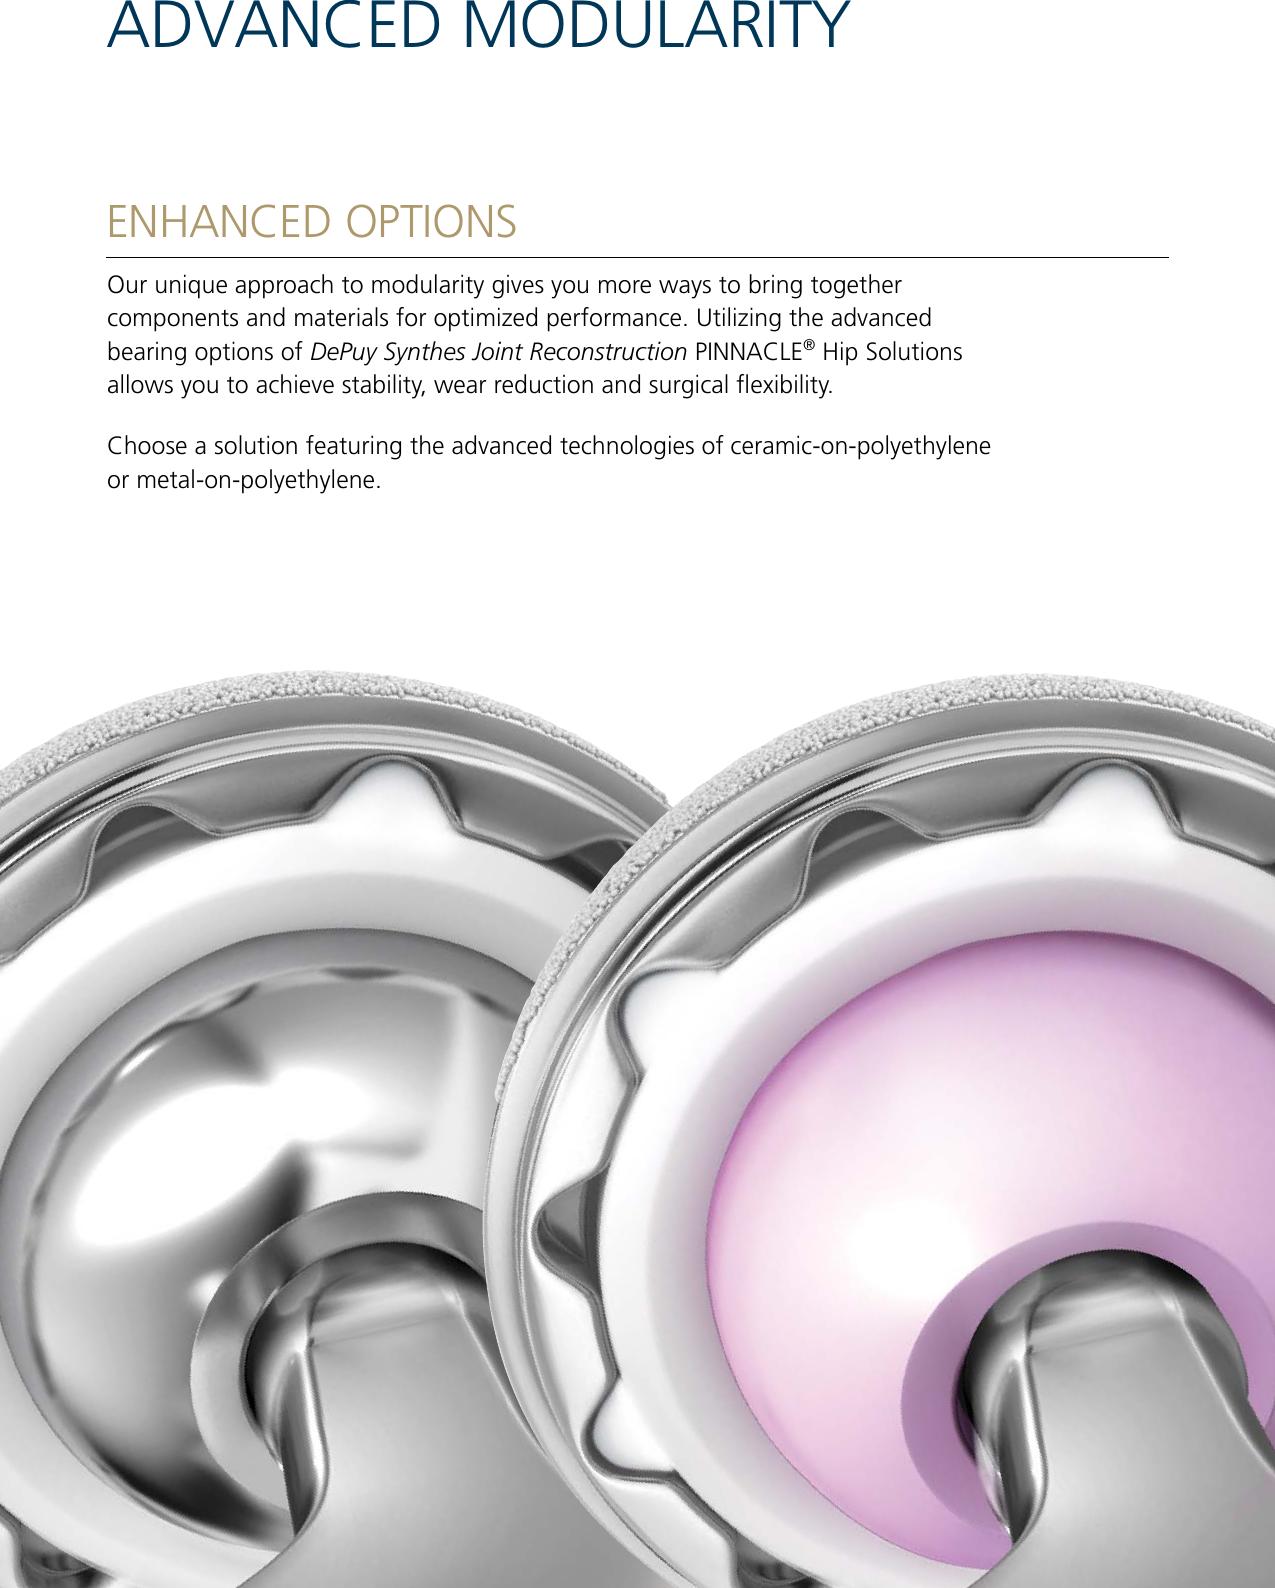 DPY Pinnacle Hip Solutions EO 12920pdf